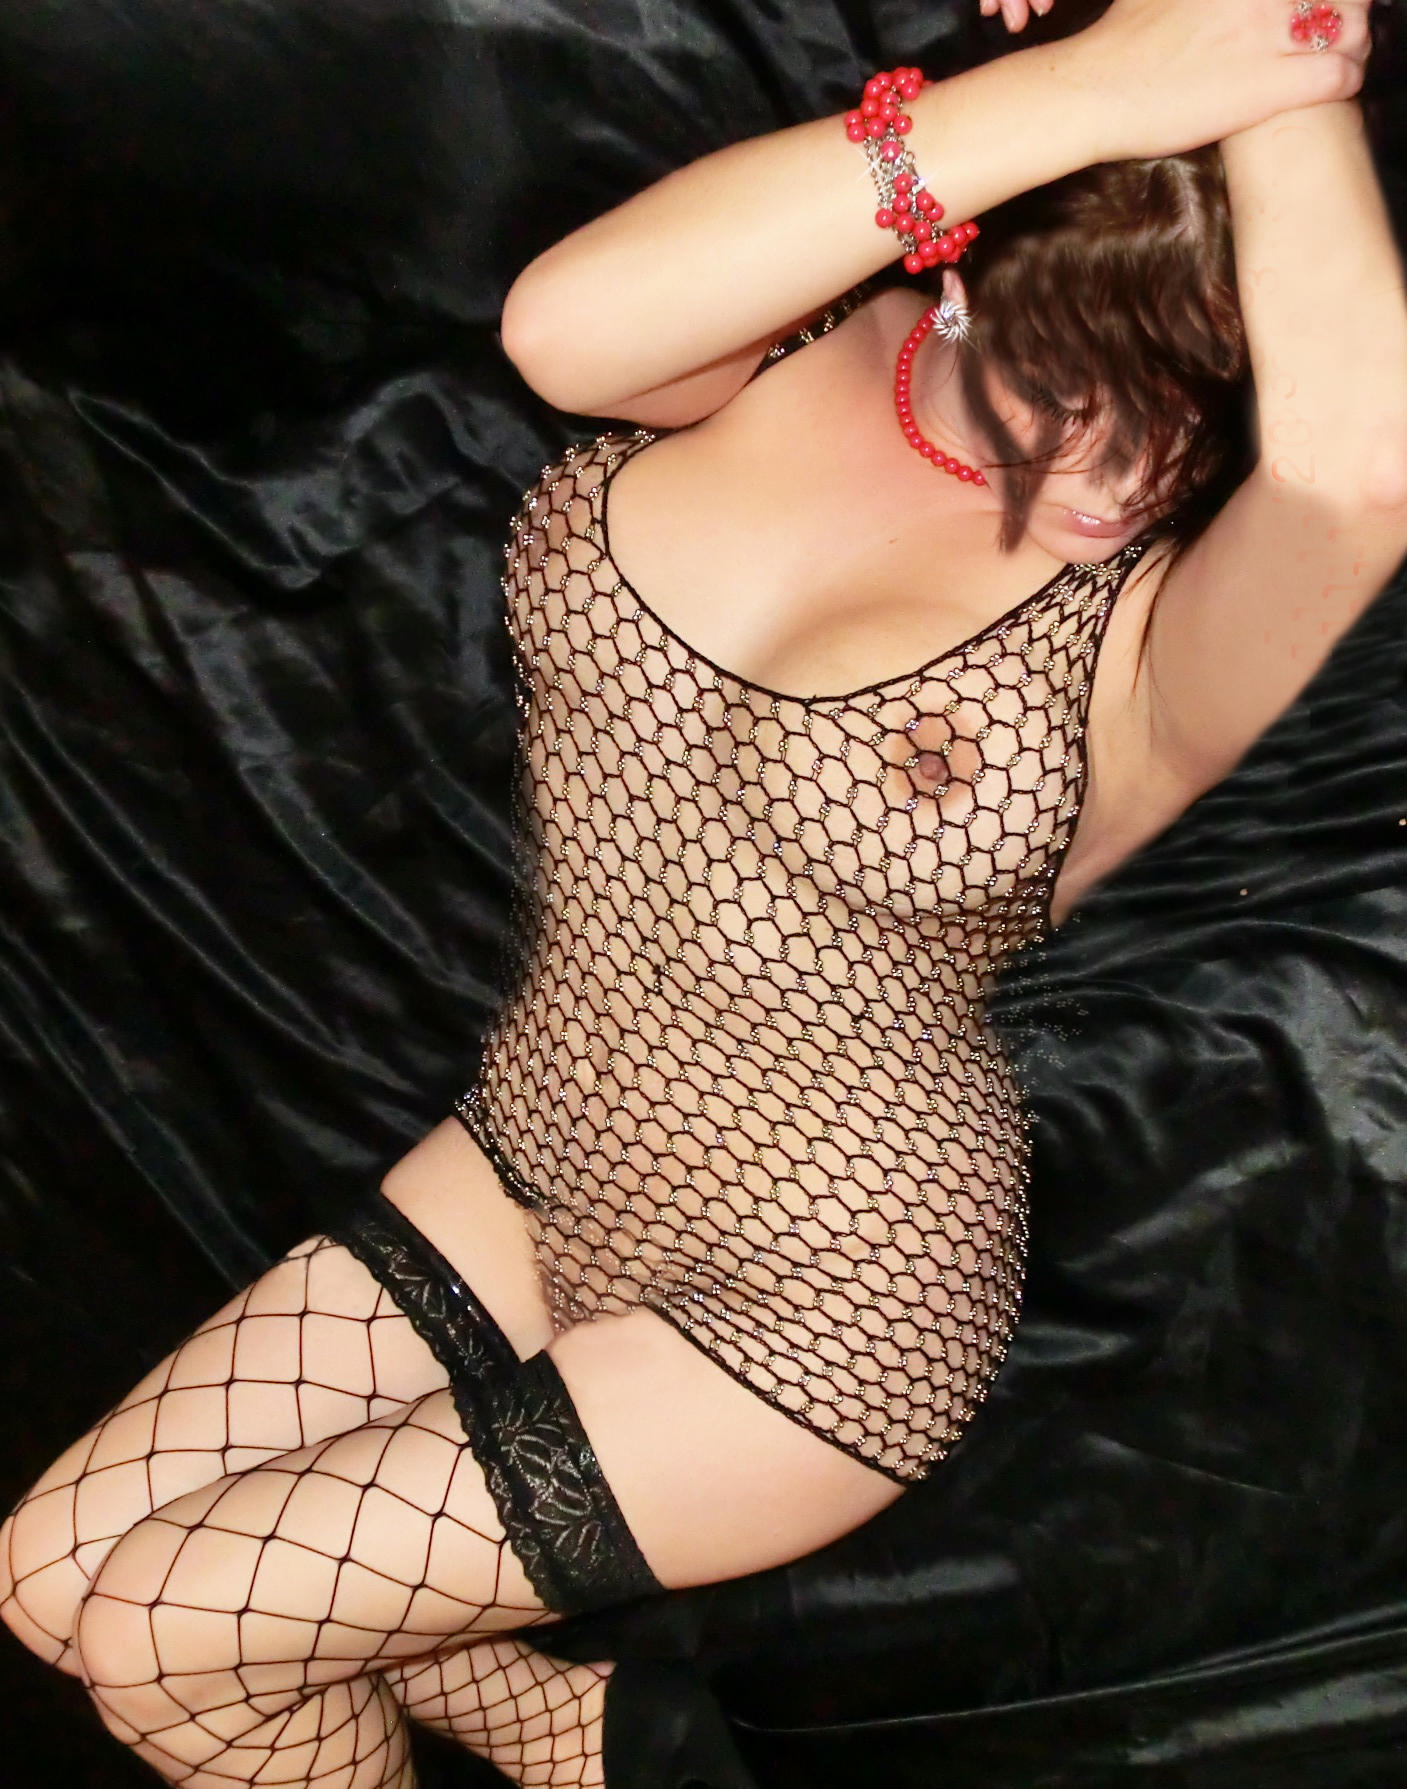 sexy busty girl